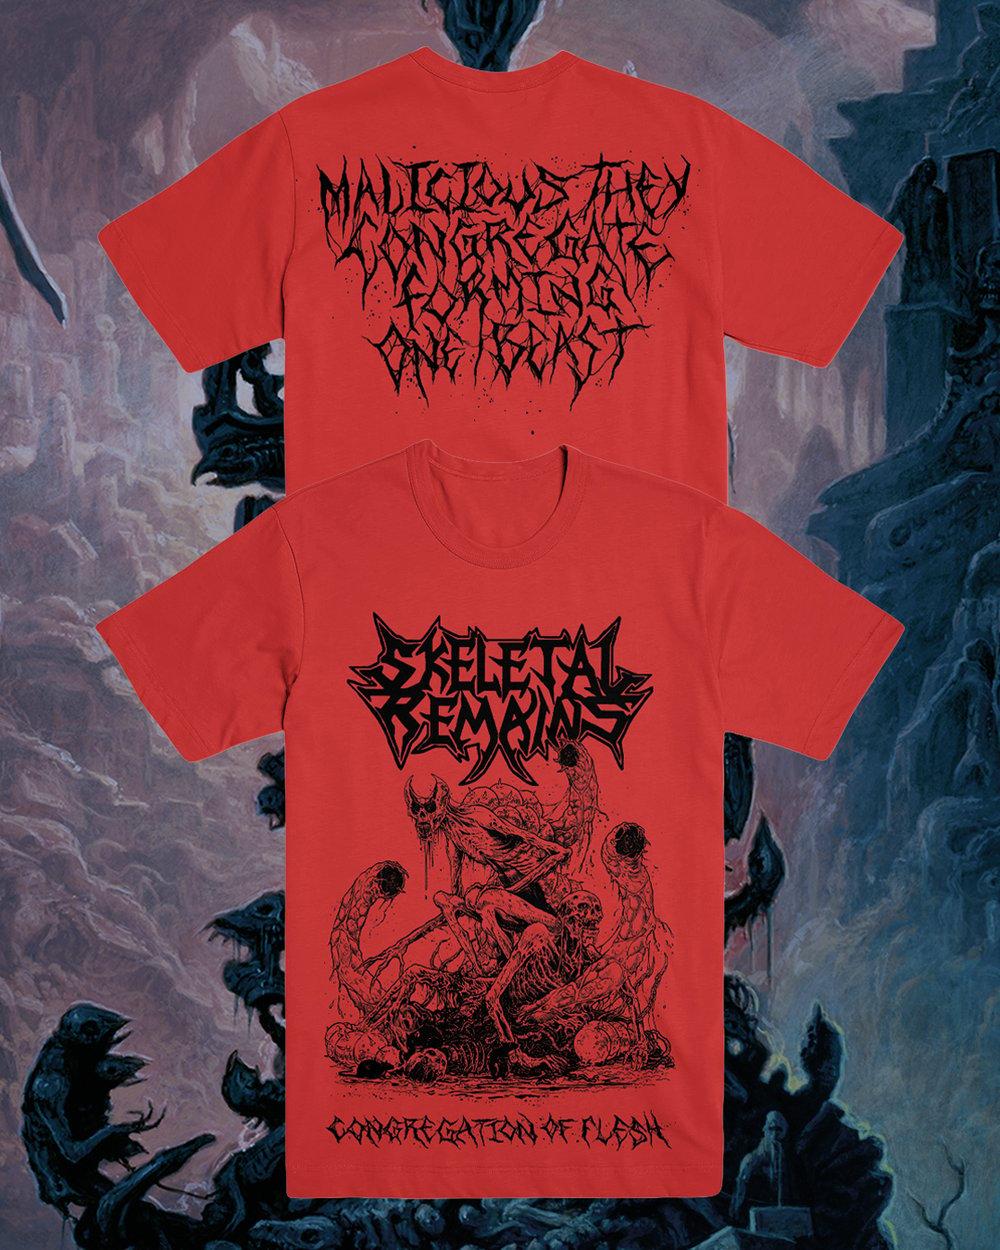 Congregation Of Flesh T-Shirt